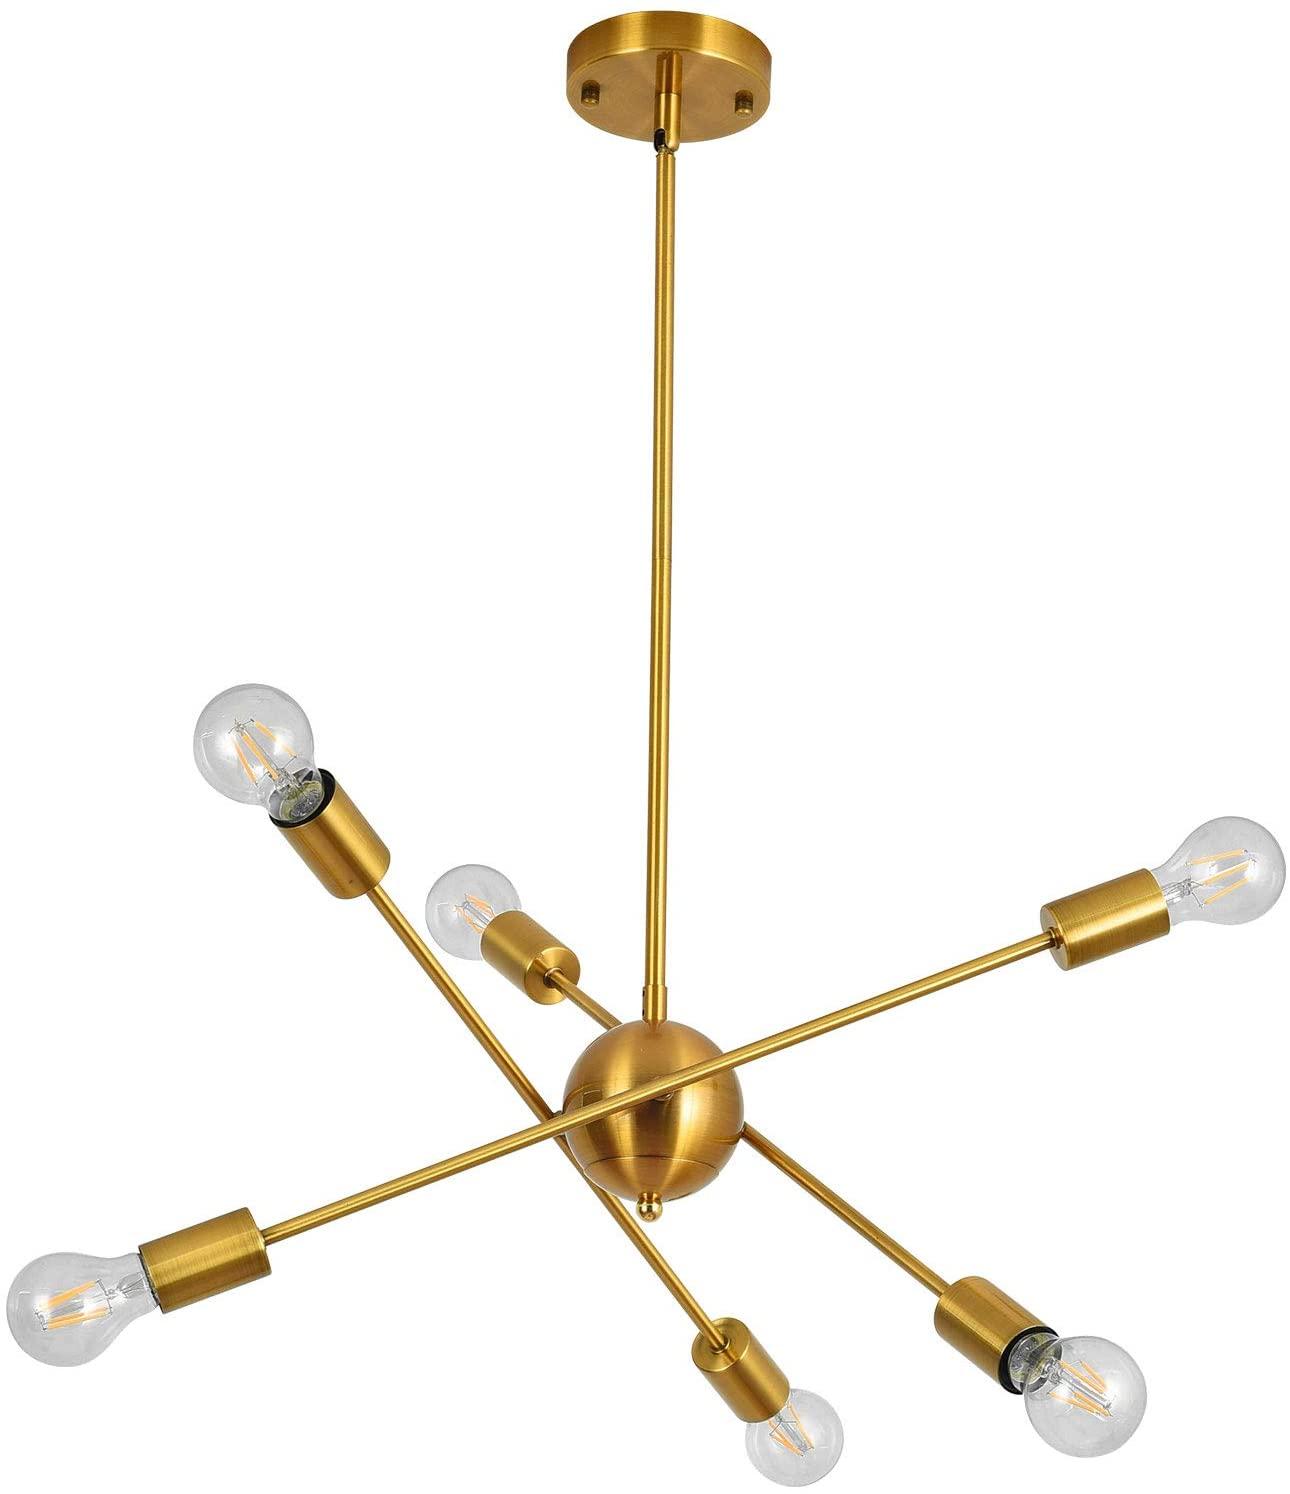 Kirahee Modern Sputnik Chandelier, 6 Lights Chandelier Pendant Lighting Mid Century Modern Industrial Starburst Style Ceiling Lamp Light Fixture for Flat and Sloped Ceiling Brass Finish